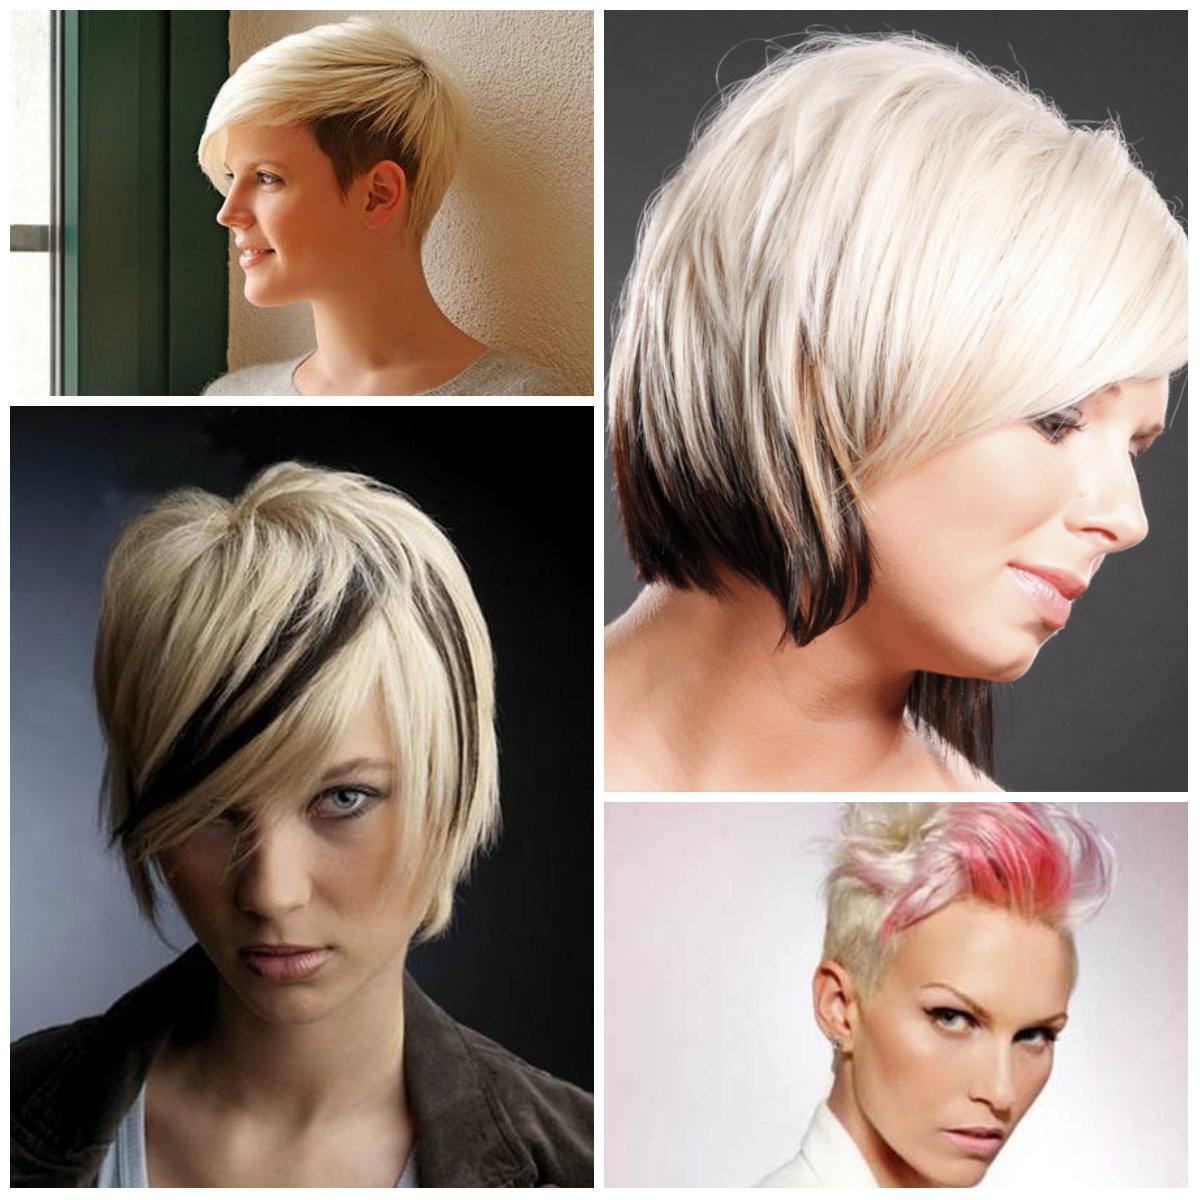 2016 two-tone hair colors for short haircuts | 2017 haircuts